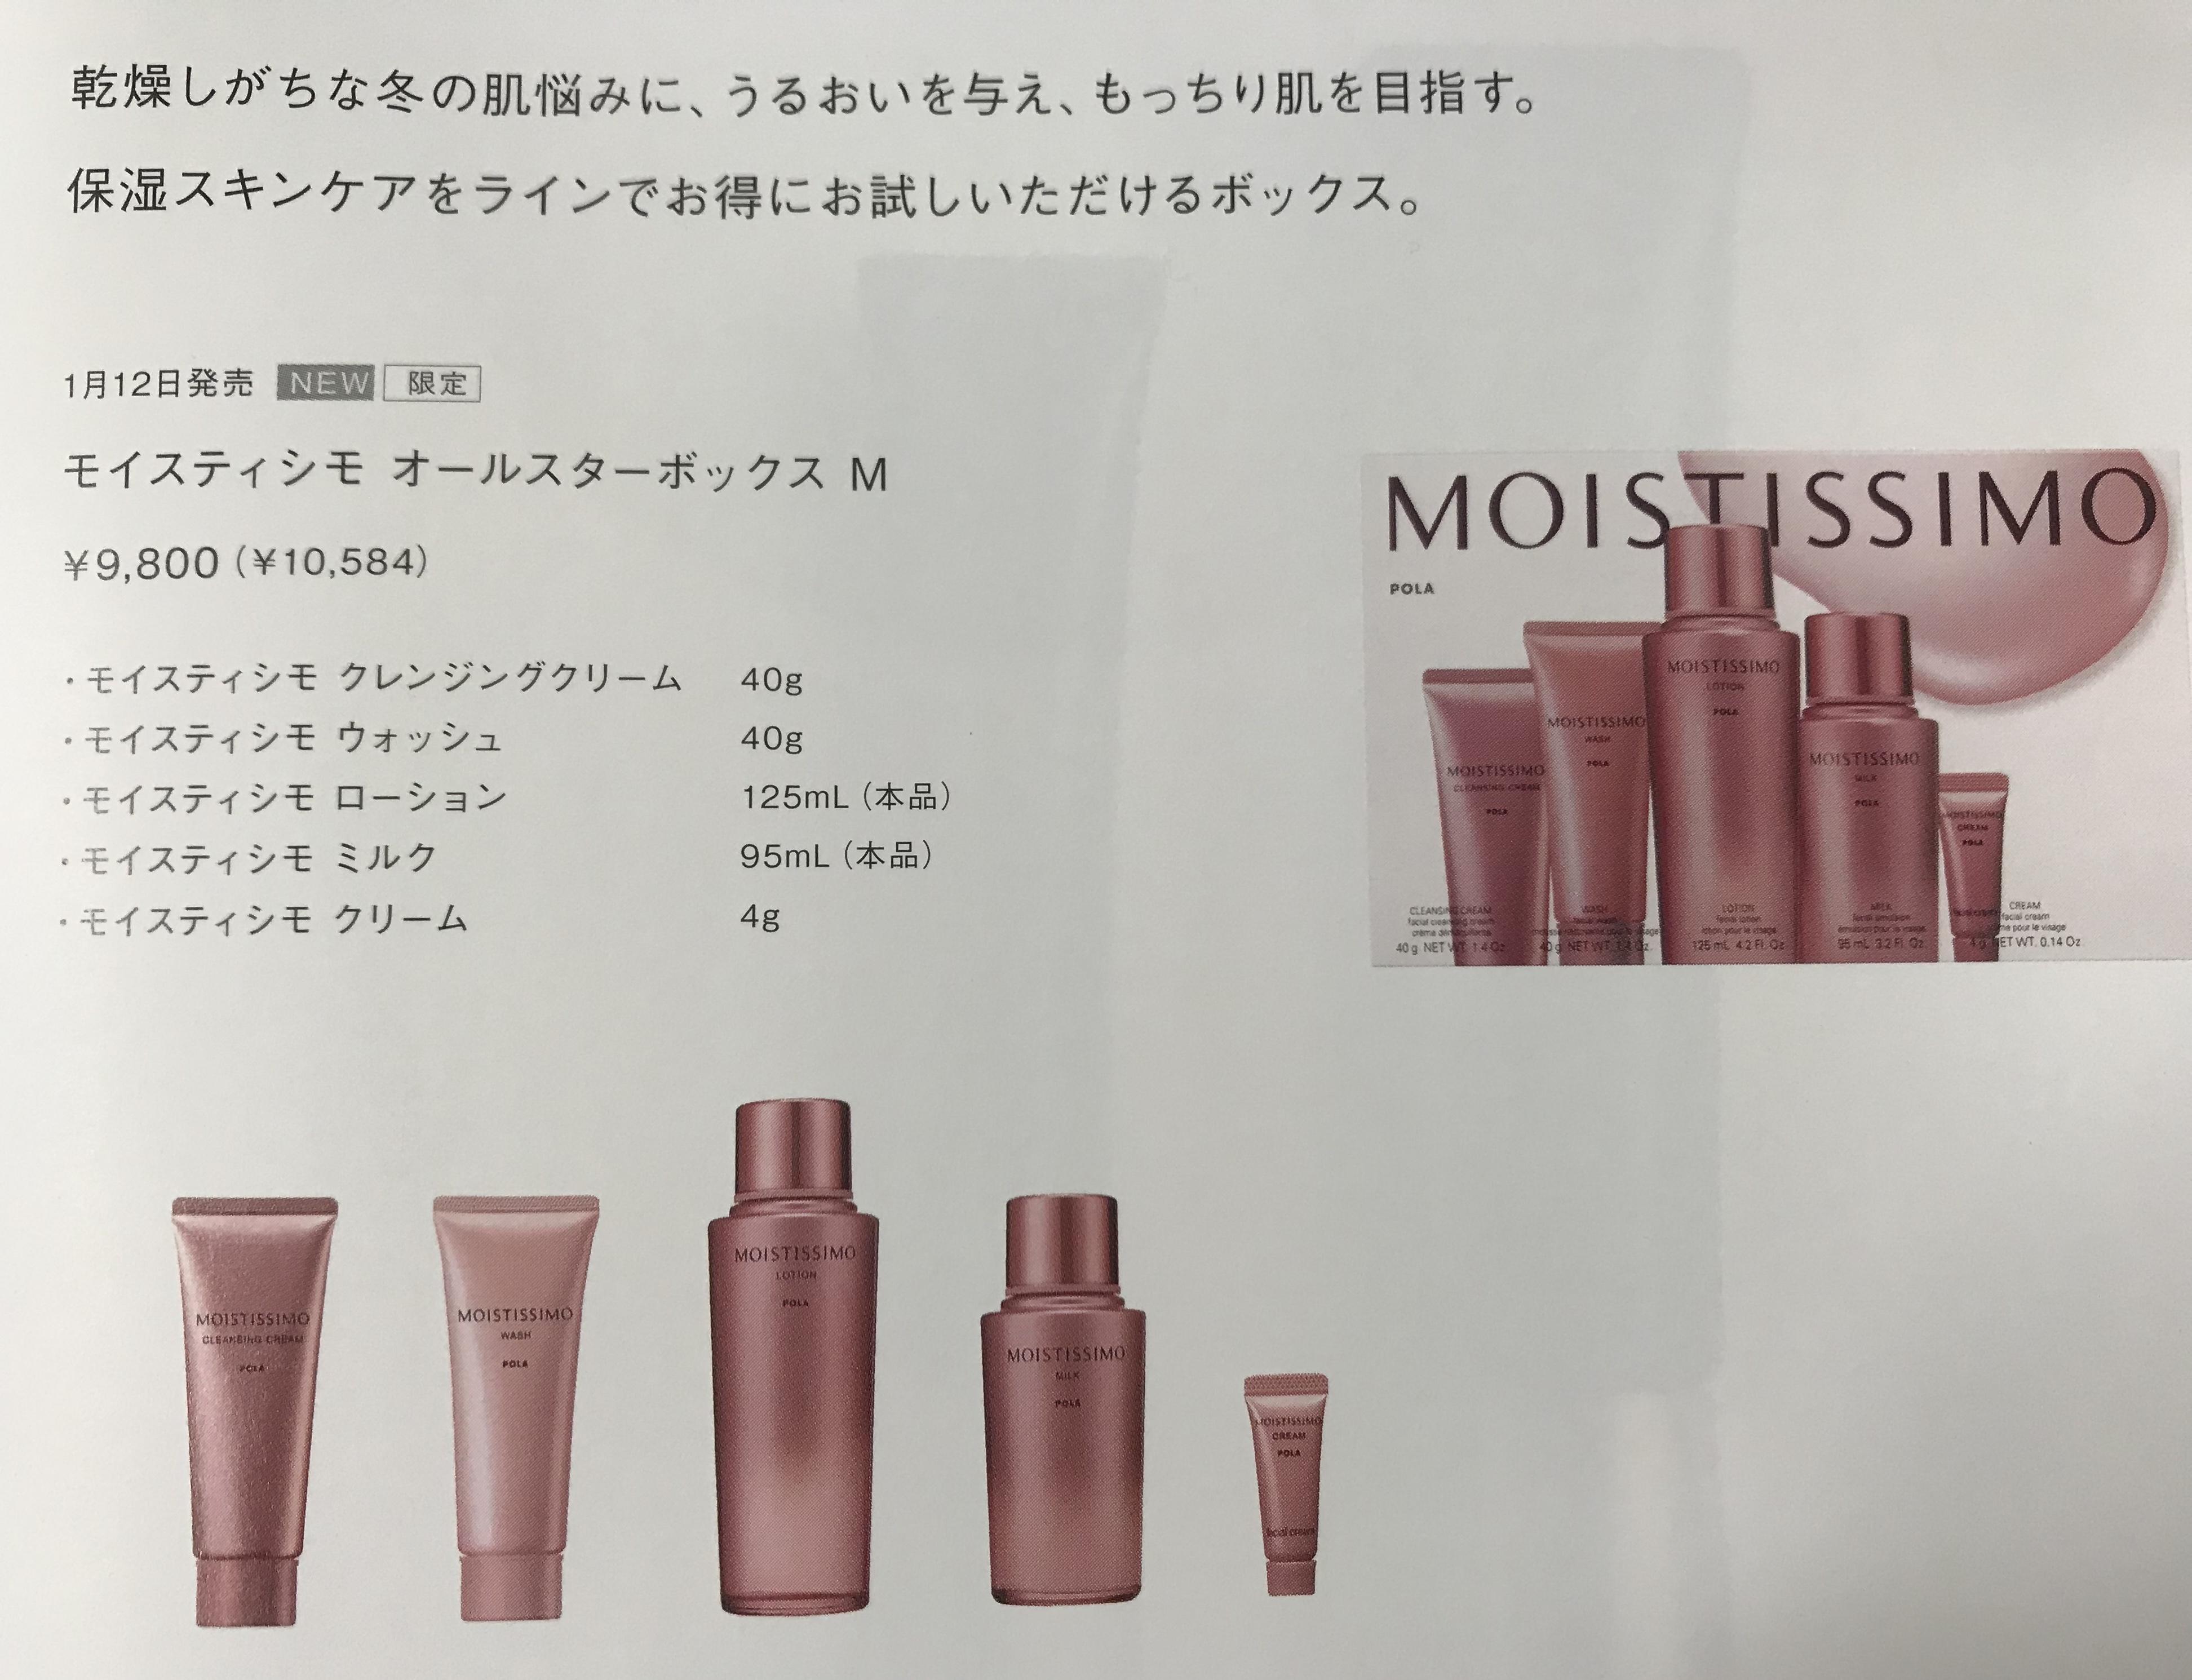 【POLA】新商品情報&店休日のお知らせ